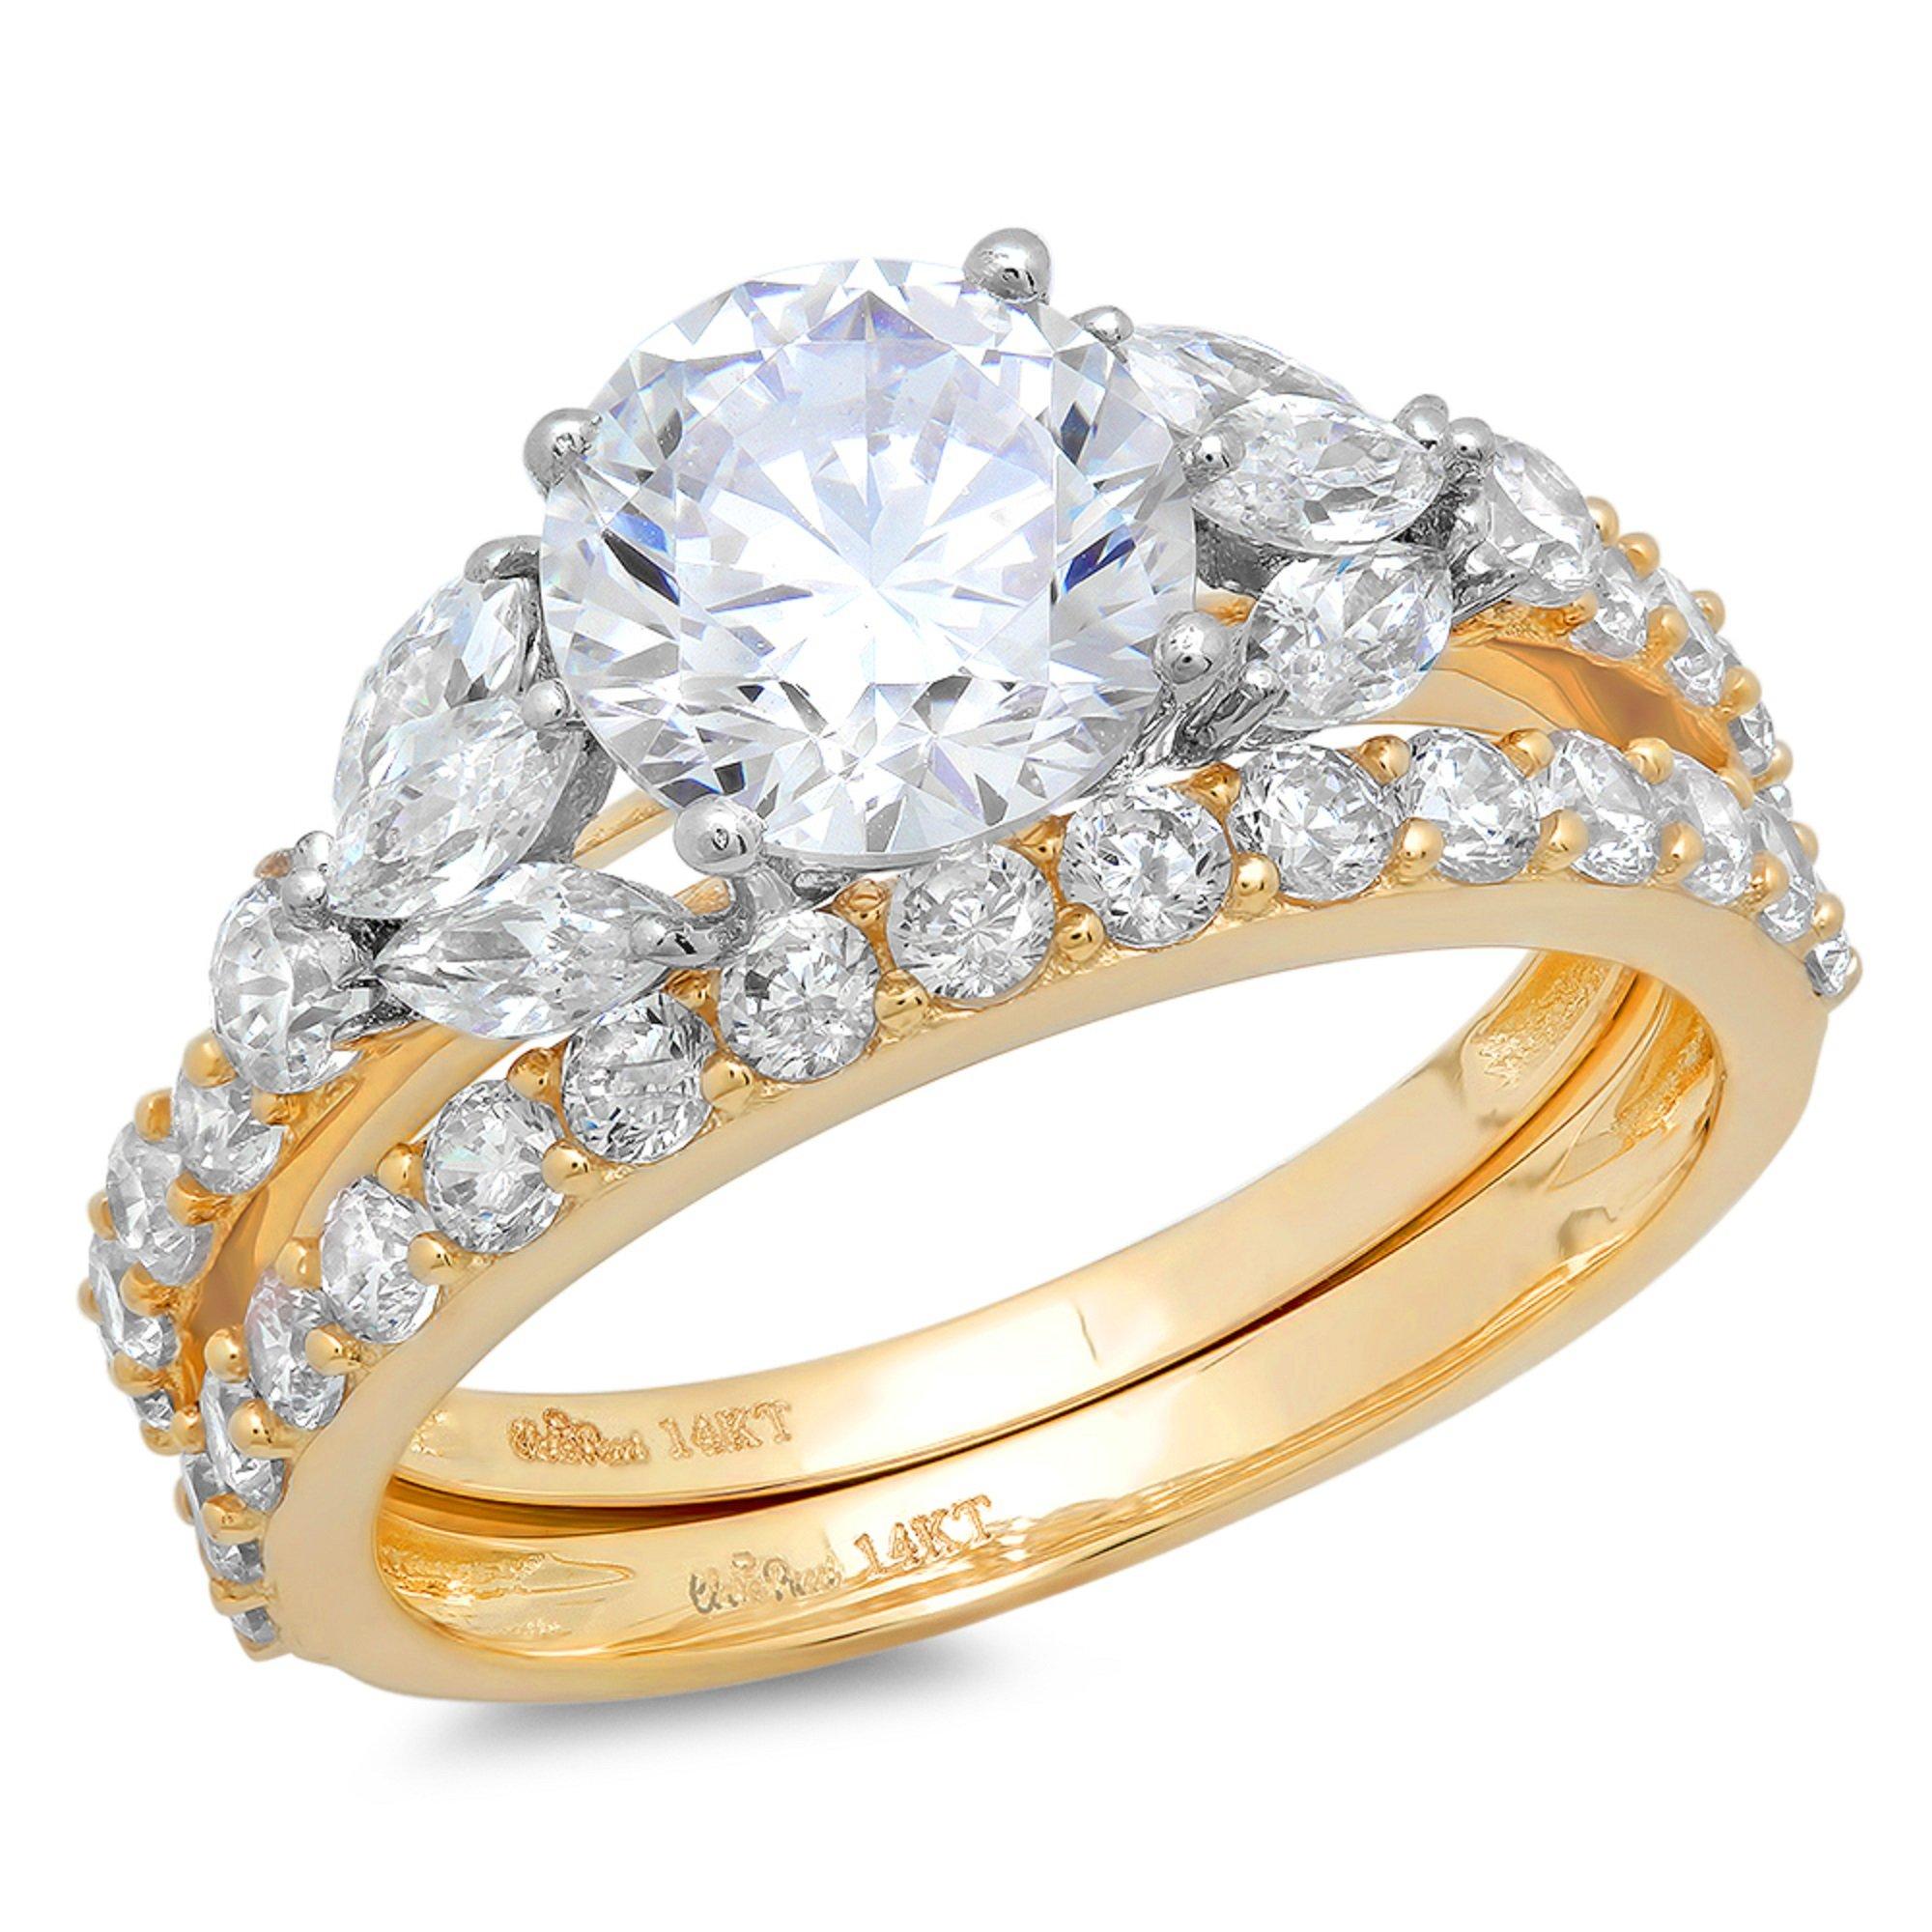 2.92 Ct Round Marquise Cut Halo Engagement Wedding Bridal Anniversary Ring Set 14K Yellow Gold, Size 9, Clara Pucci